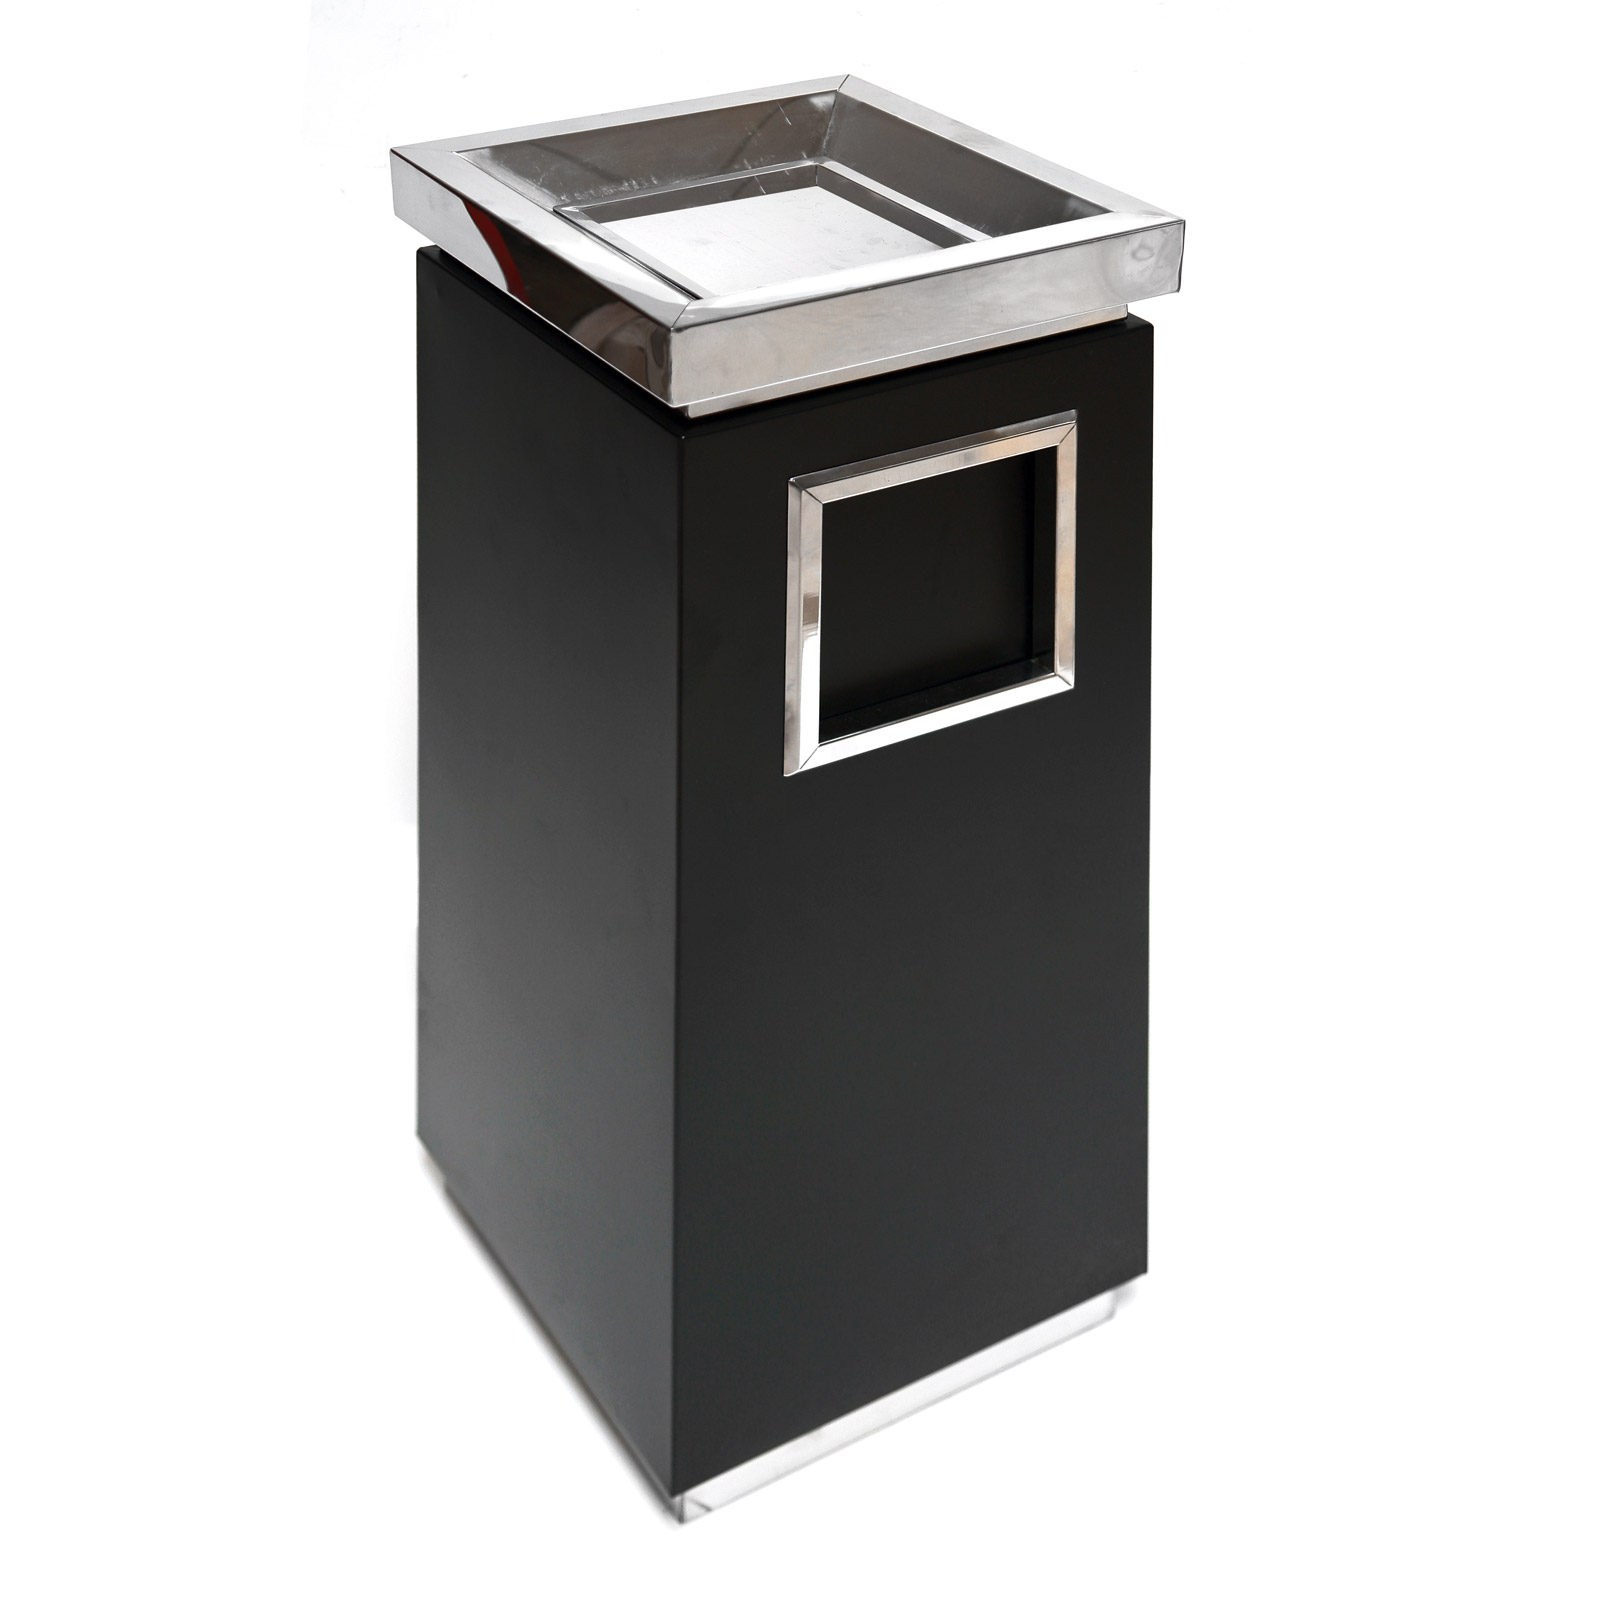 standaschenbecher schwarz 28x28x65 cm f r drau en 17275 ebay. Black Bedroom Furniture Sets. Home Design Ideas